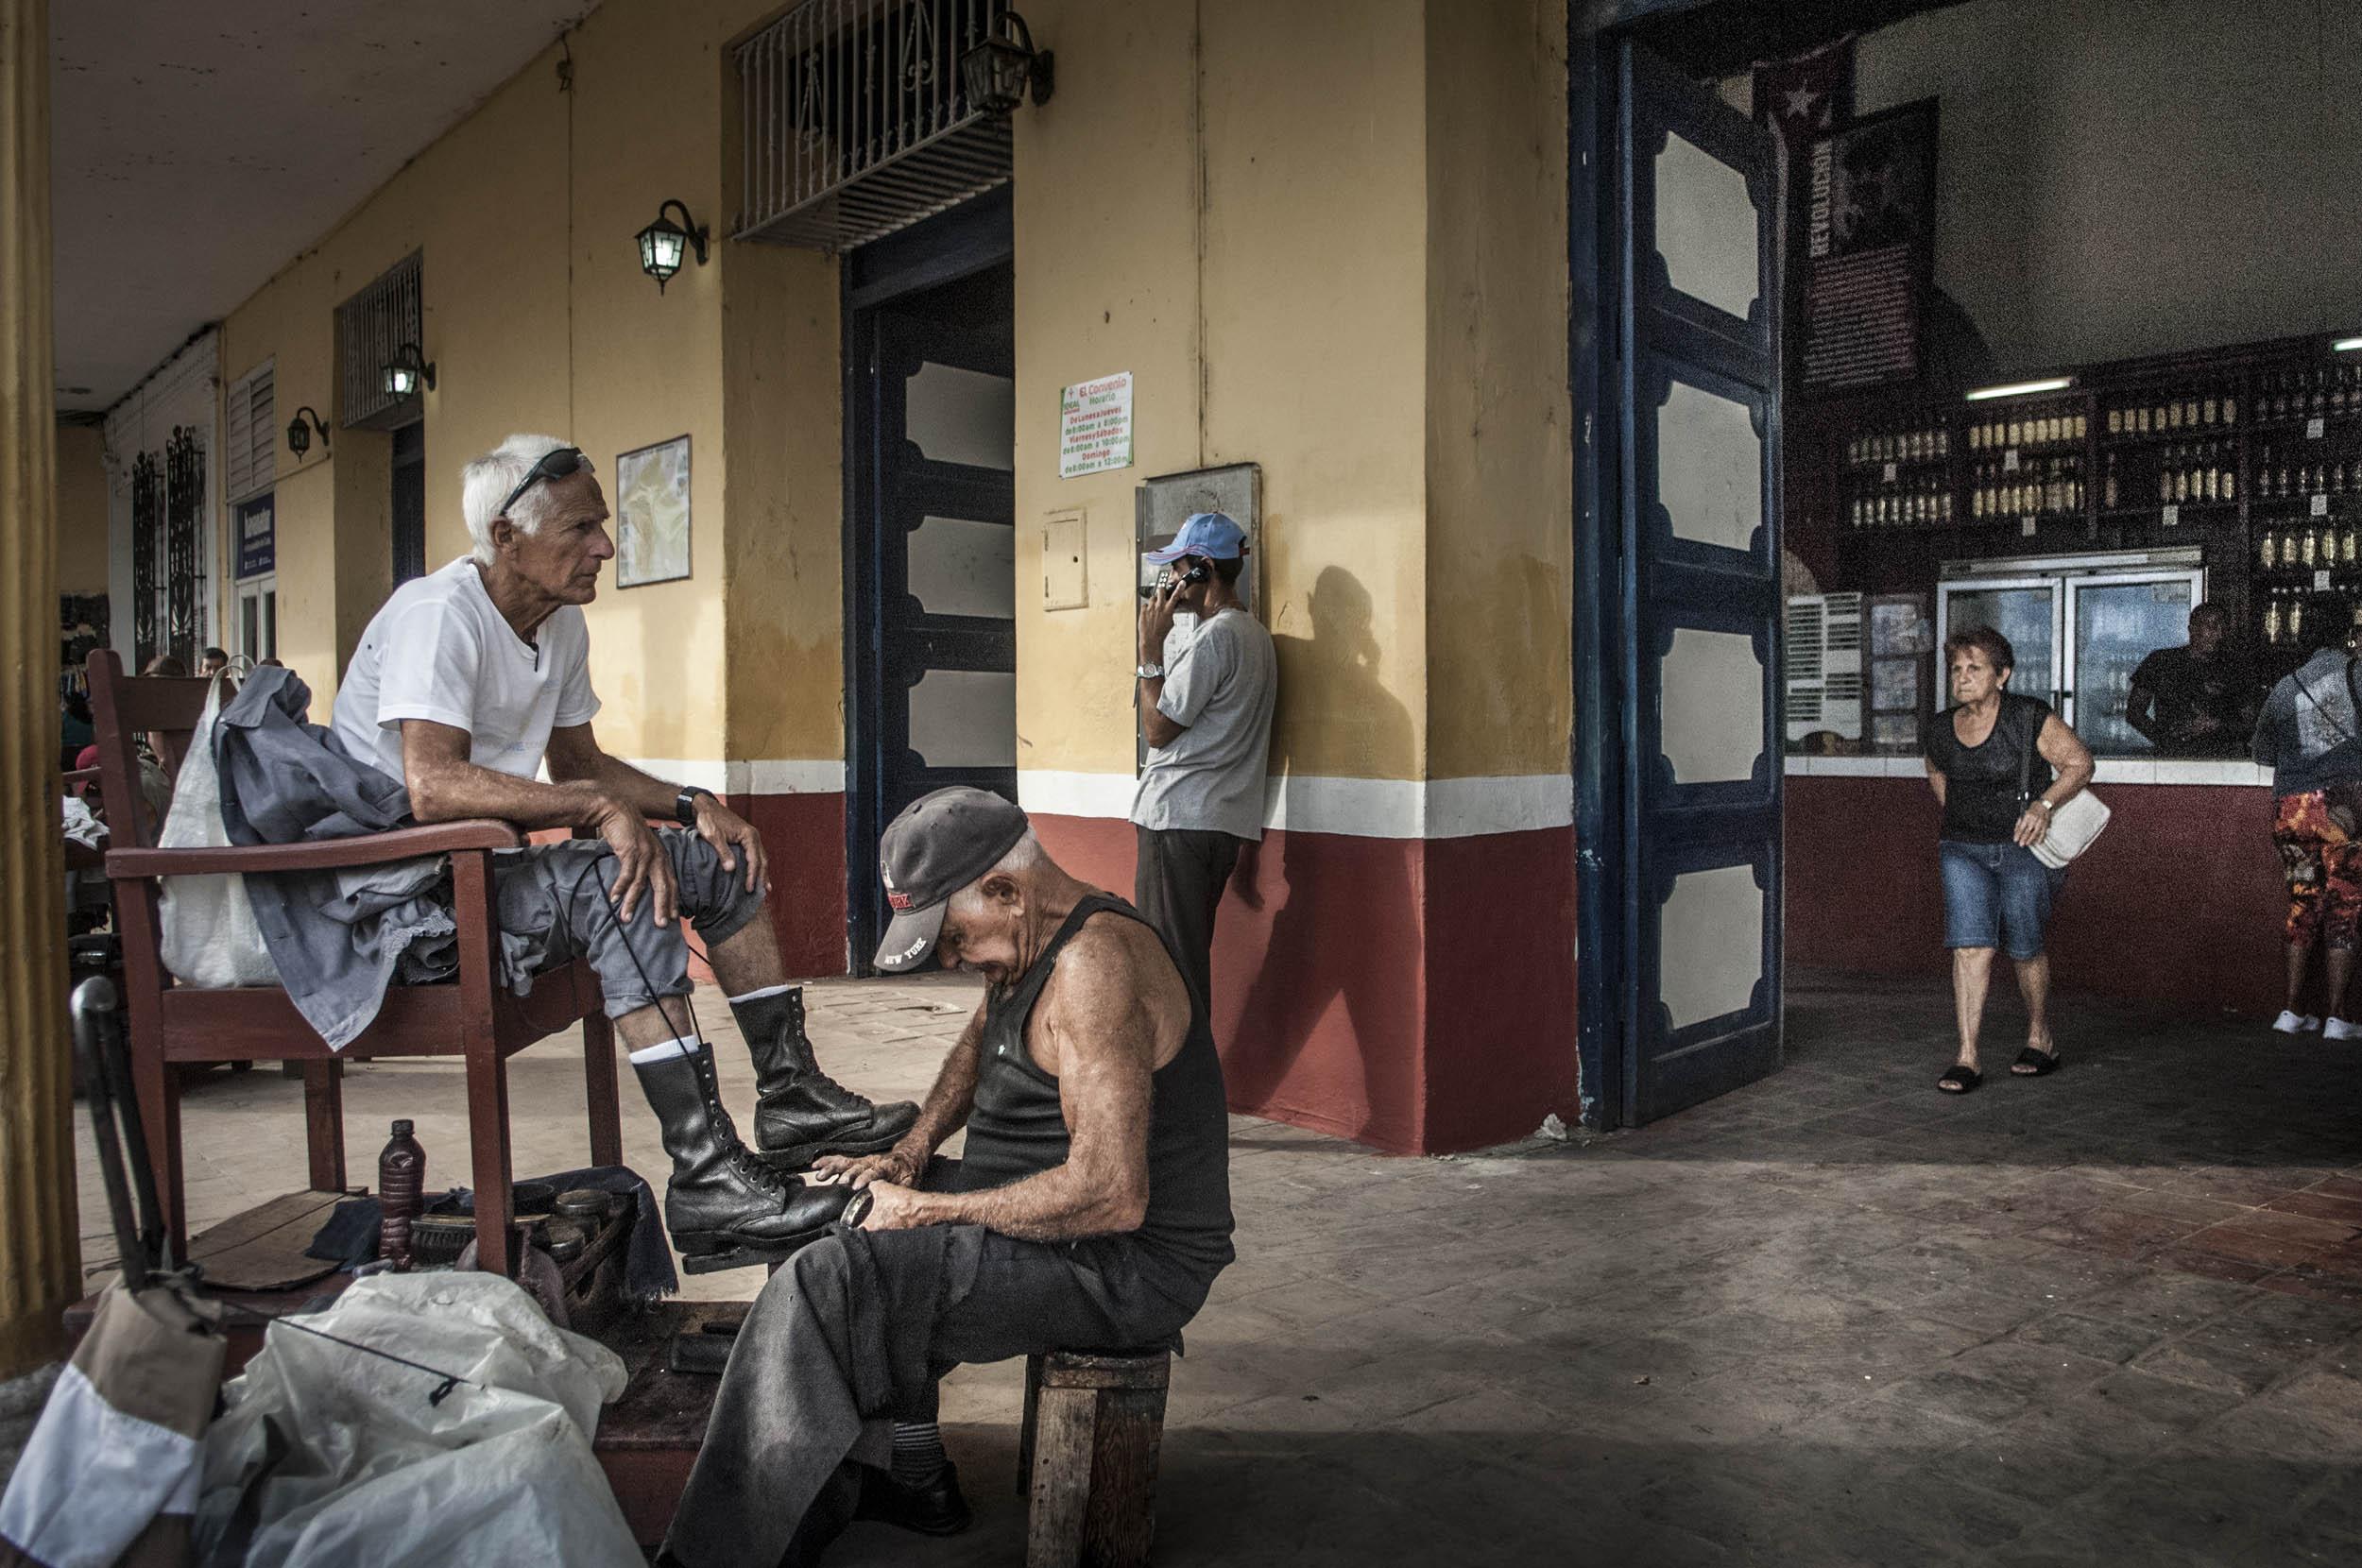 Sancti Spíritus, Cuba - Ethnos - Hector Garrido, Aerial and human photography